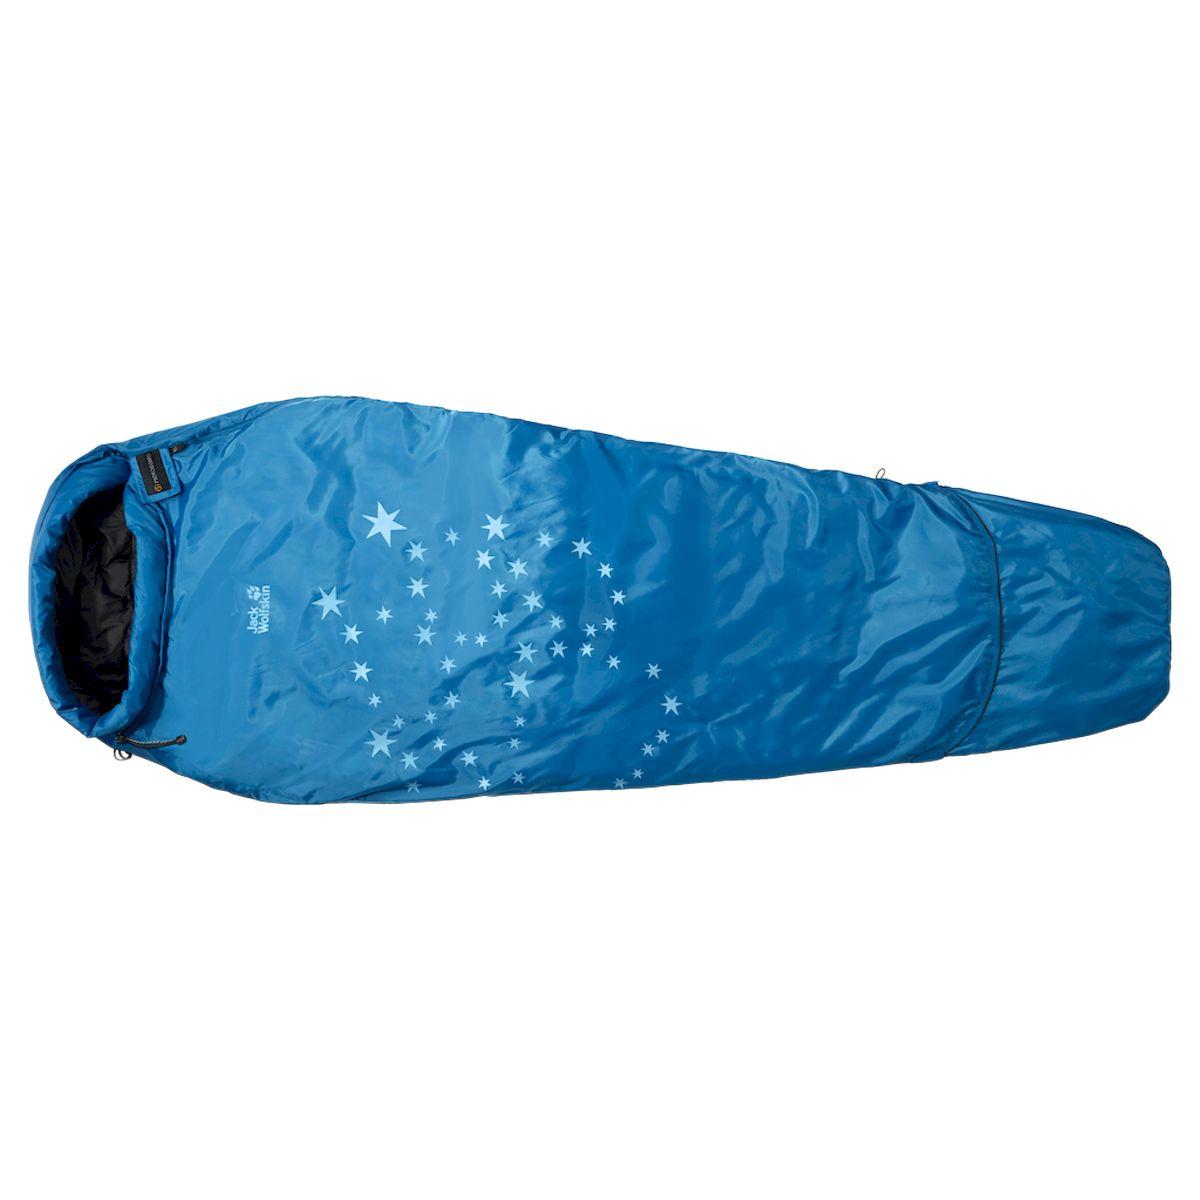 Спальный мешок-кокон Jack Wolfskin Grow Up Star, 3001872-1062, синий, 160 х 70 см цена и фото